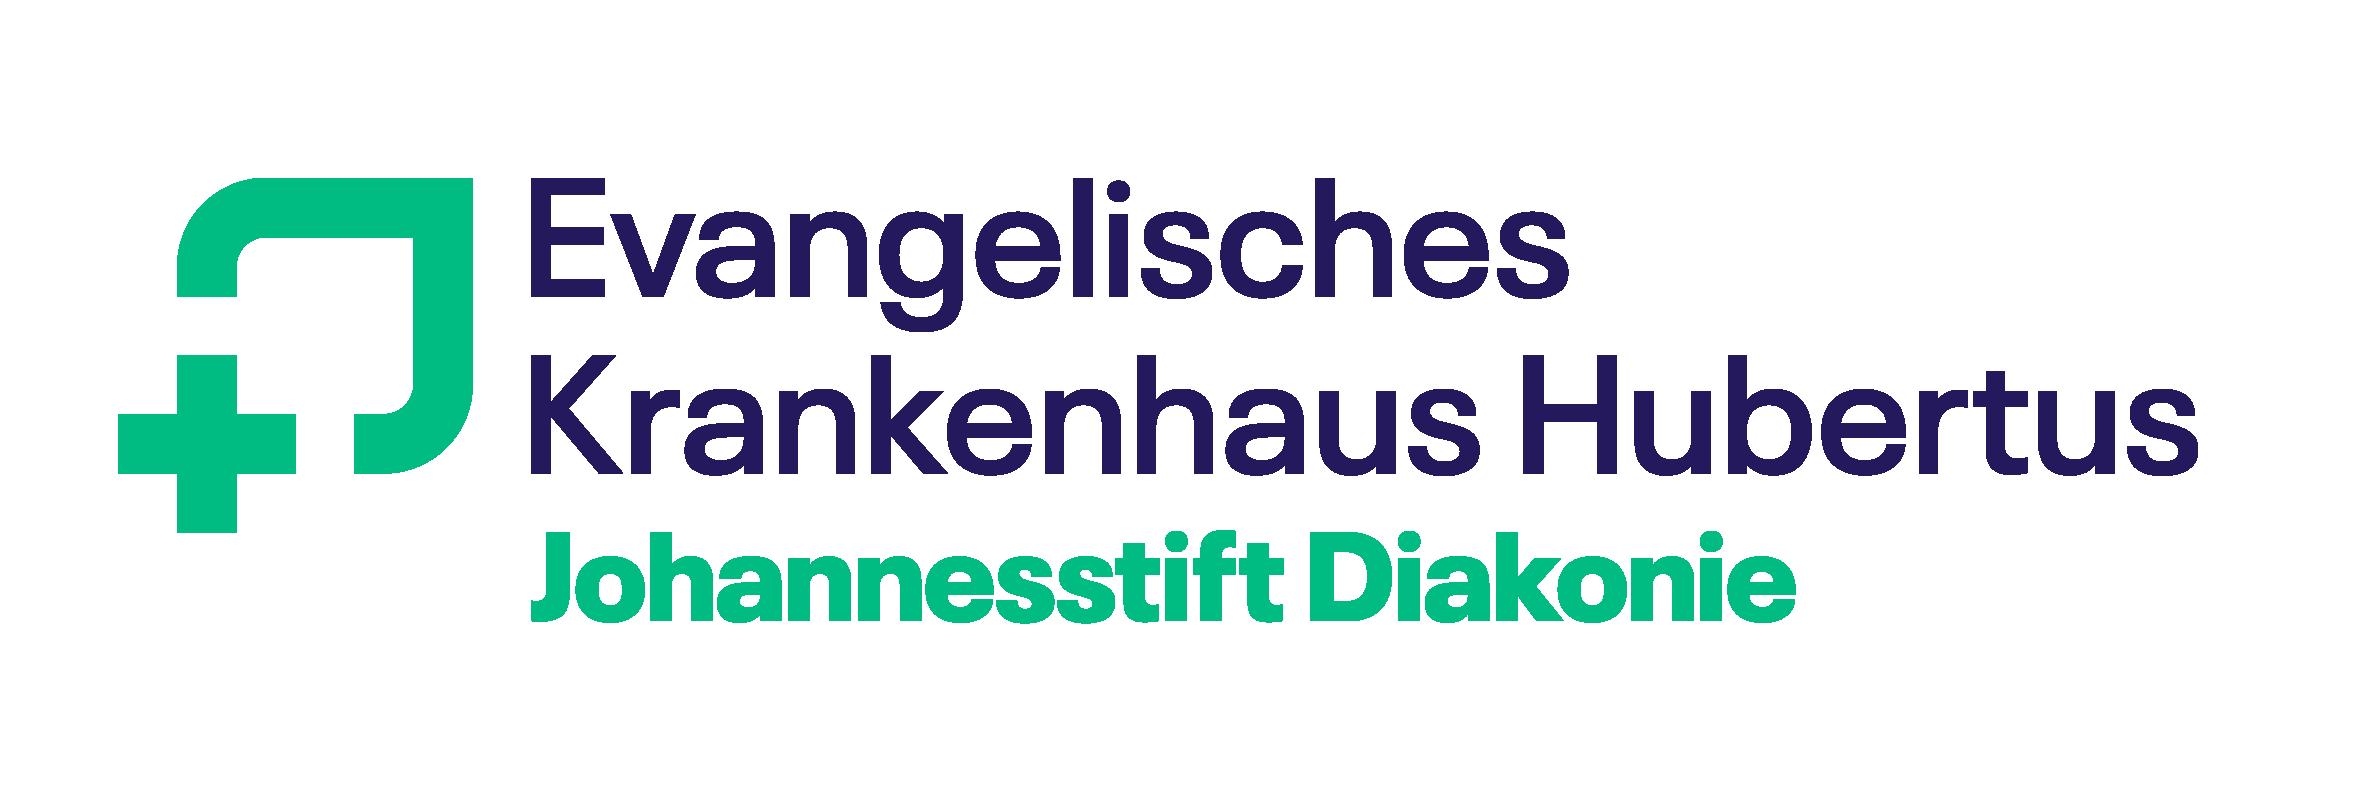 Logo: Evangelisches Krankenhaus Hubertus